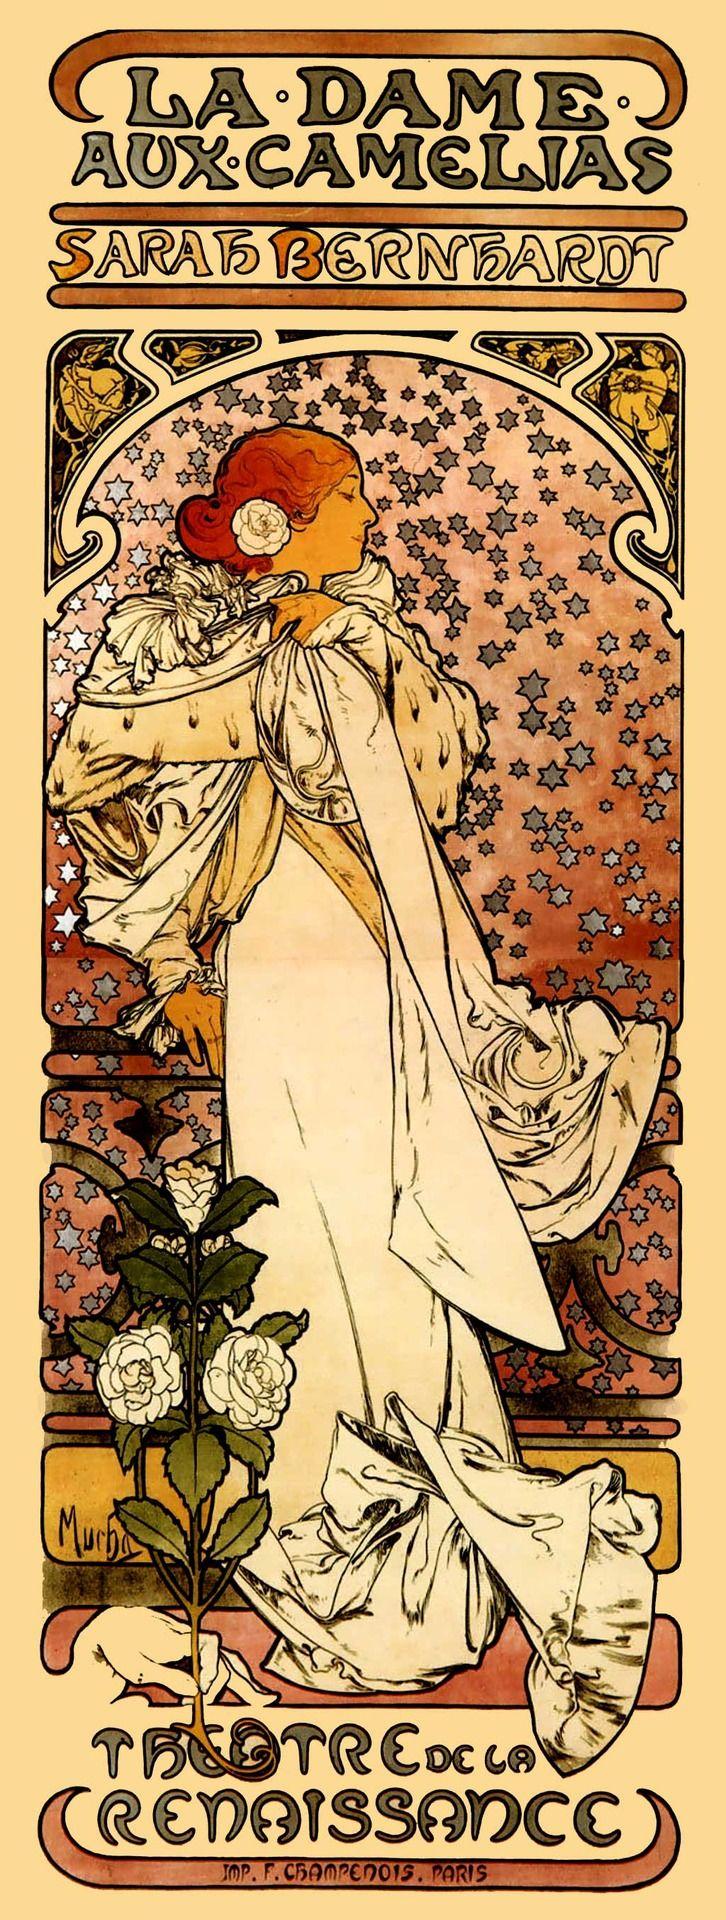 Mucha Art Nouveau poster of Sarah Bernhardt.